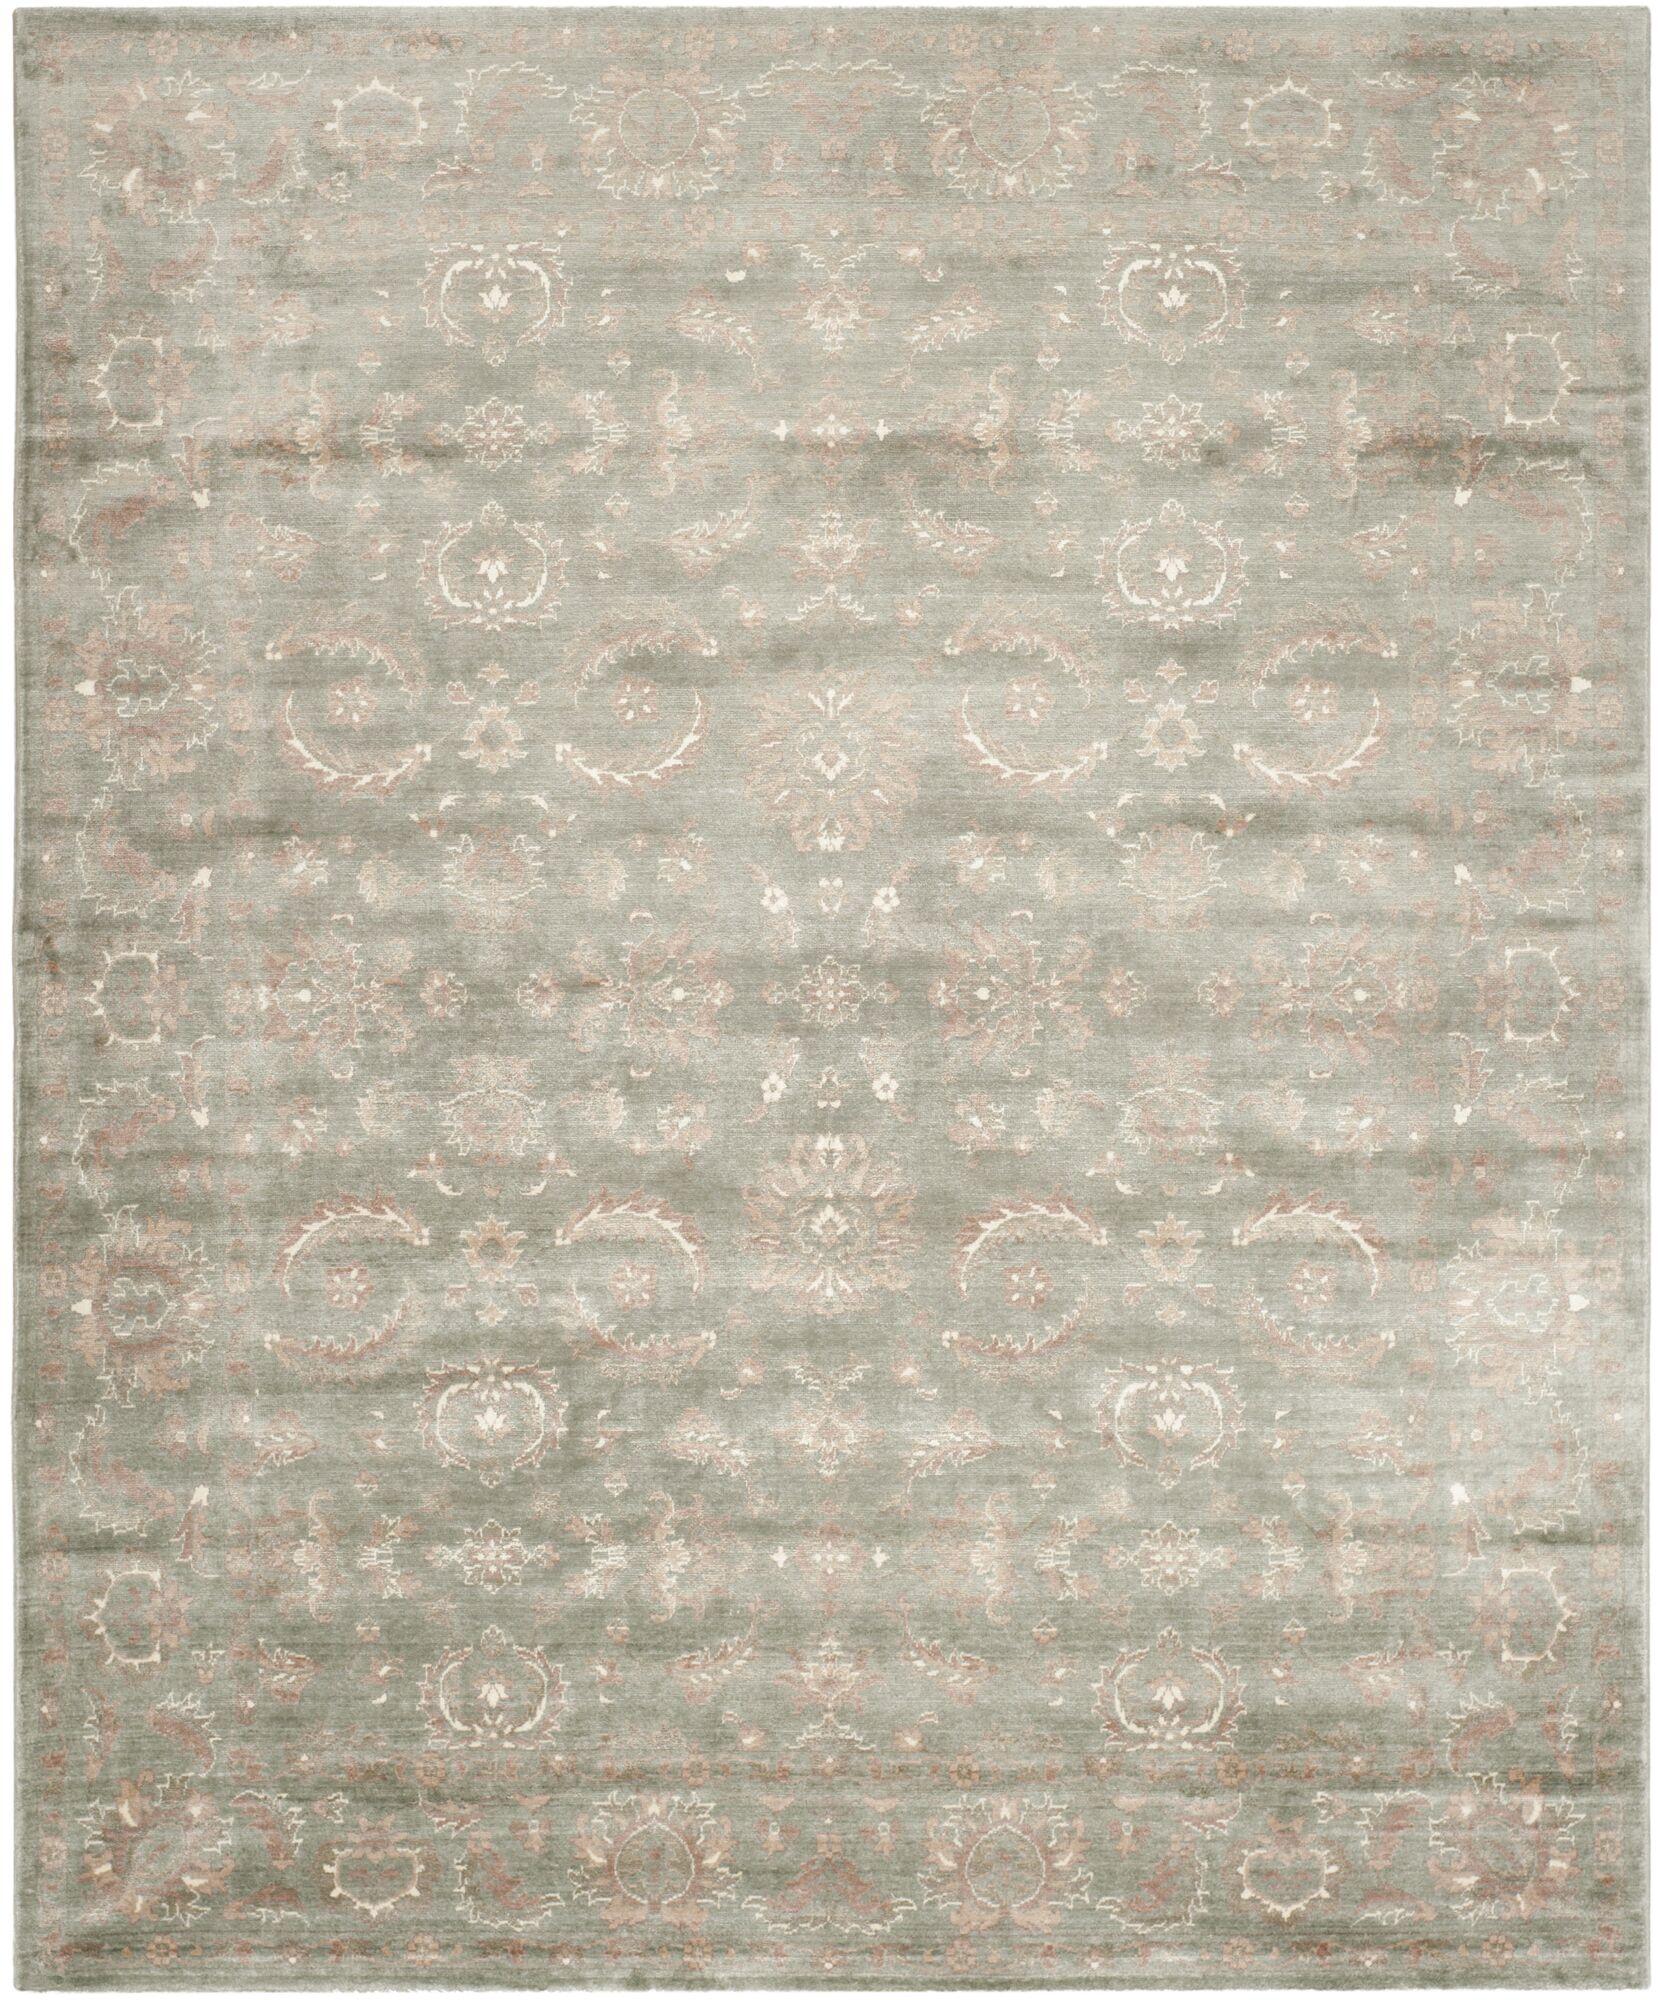 Prades Tibetan Hand Loomed Dark Gray/Ivory Area Rug Rug Size: Rectangle 8' x 10'